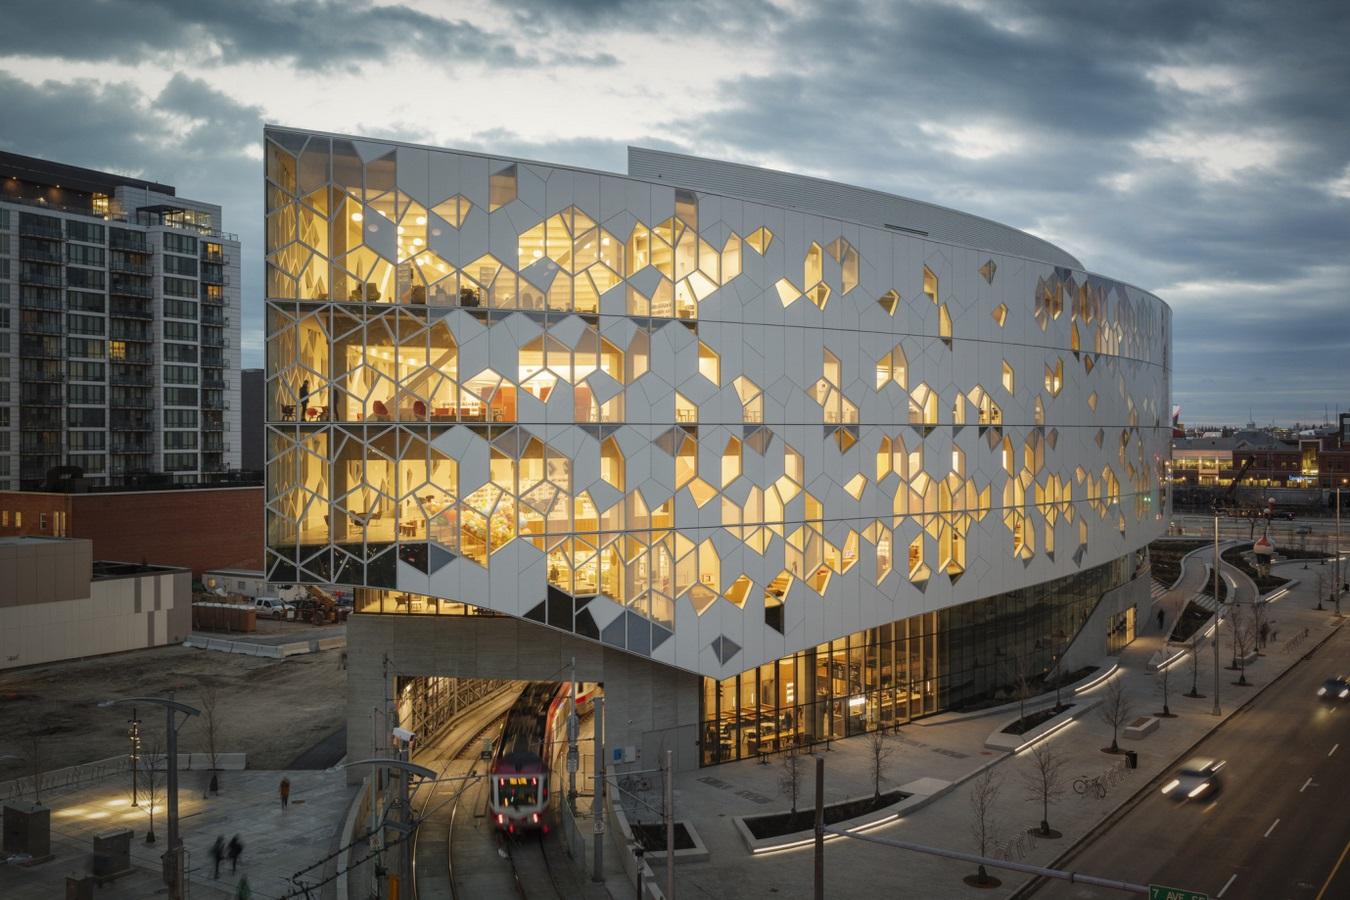 Cooper Hewitt's 2020 National Design Awards, Architecture Prize won by Snøhetta -Sheet2